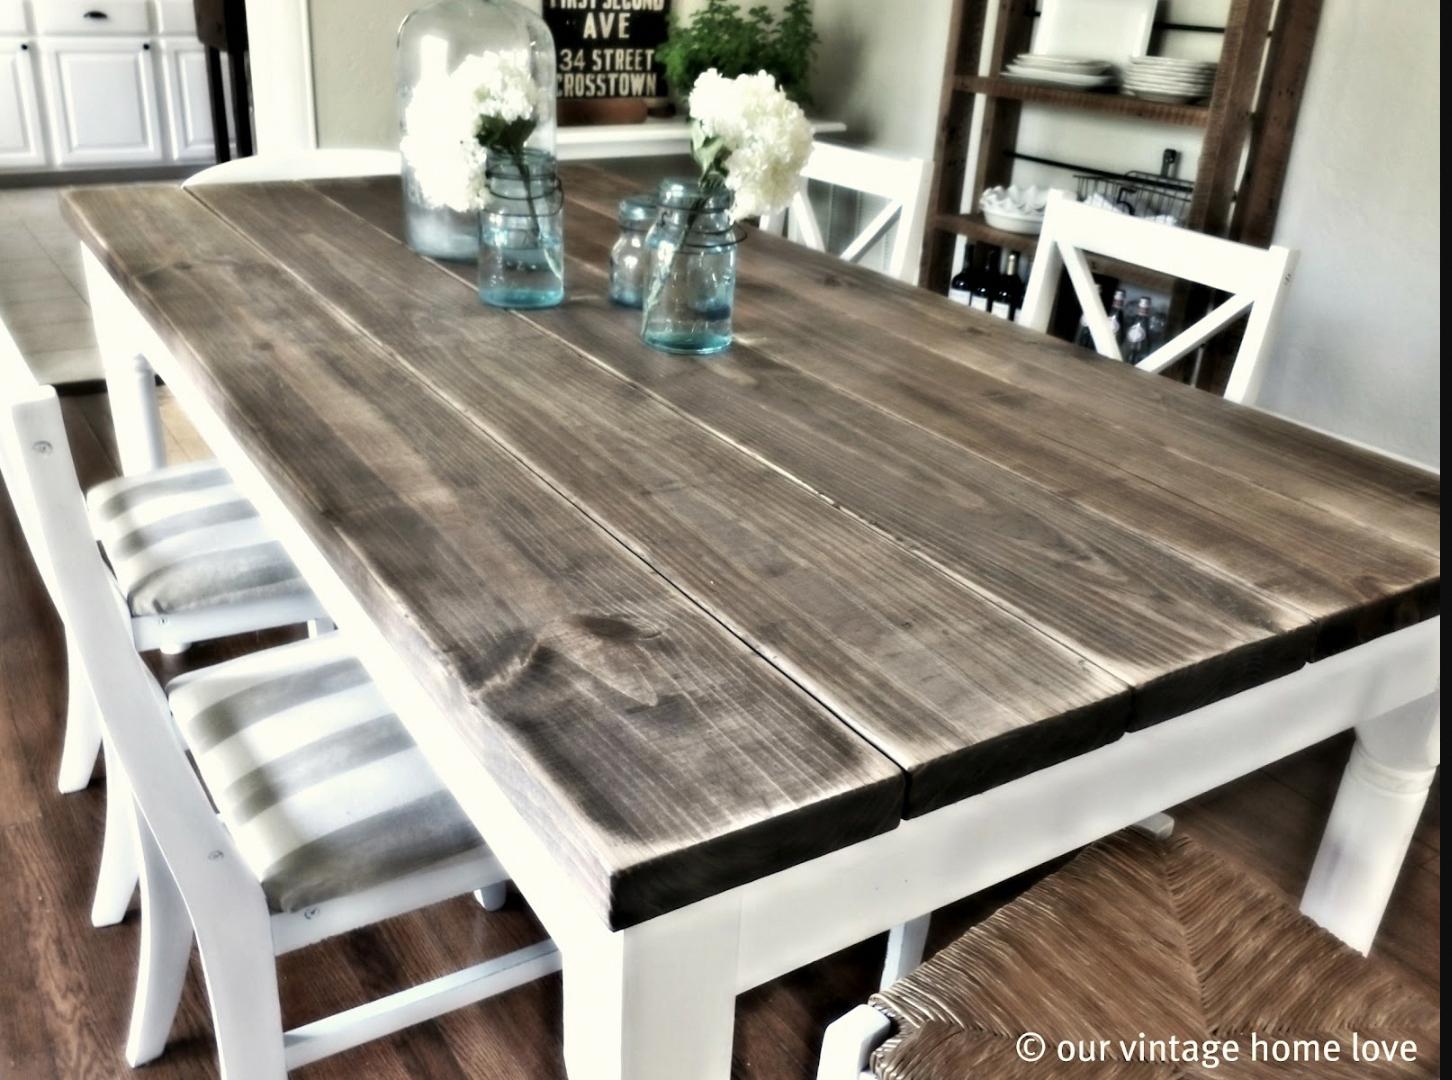 Reclaimed barn wood rustic tables